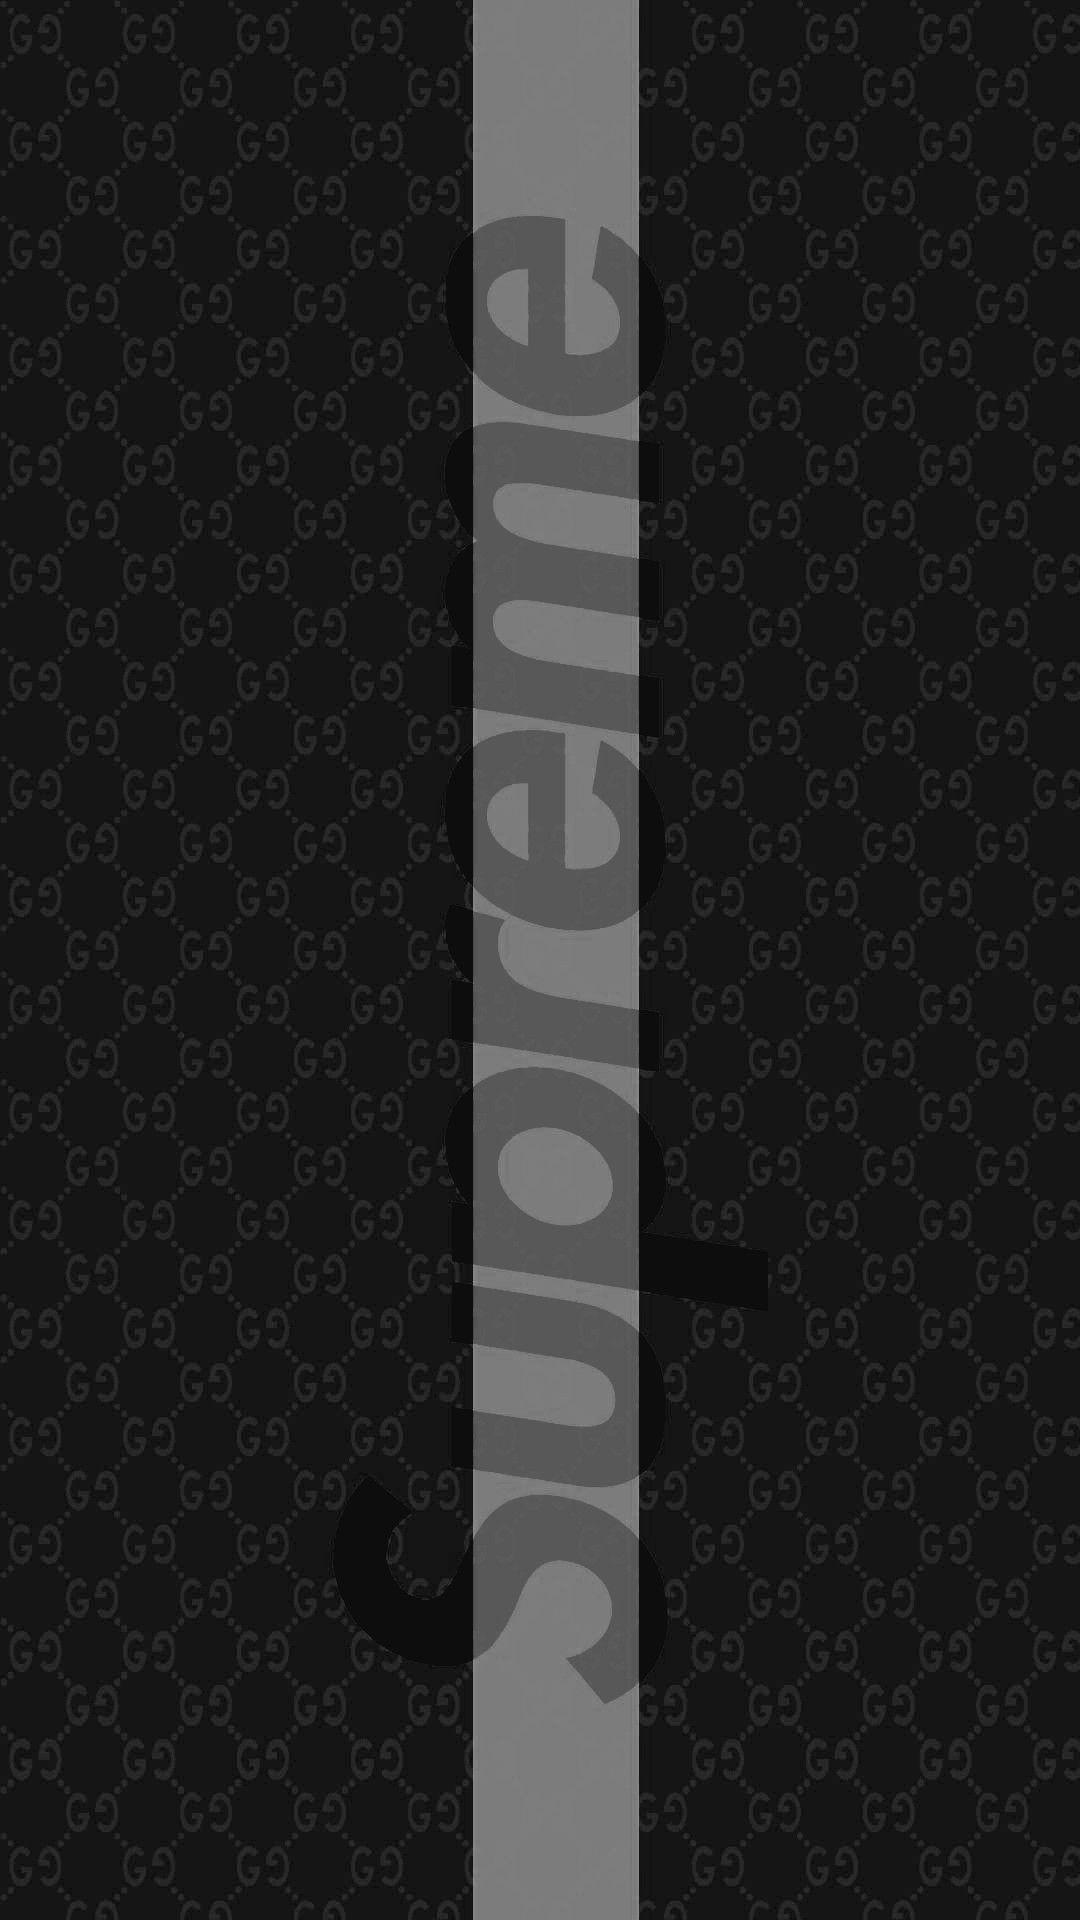 supreme iphone HD wallpaper hypebeast wallpaper Supreme iphone 1080x1920